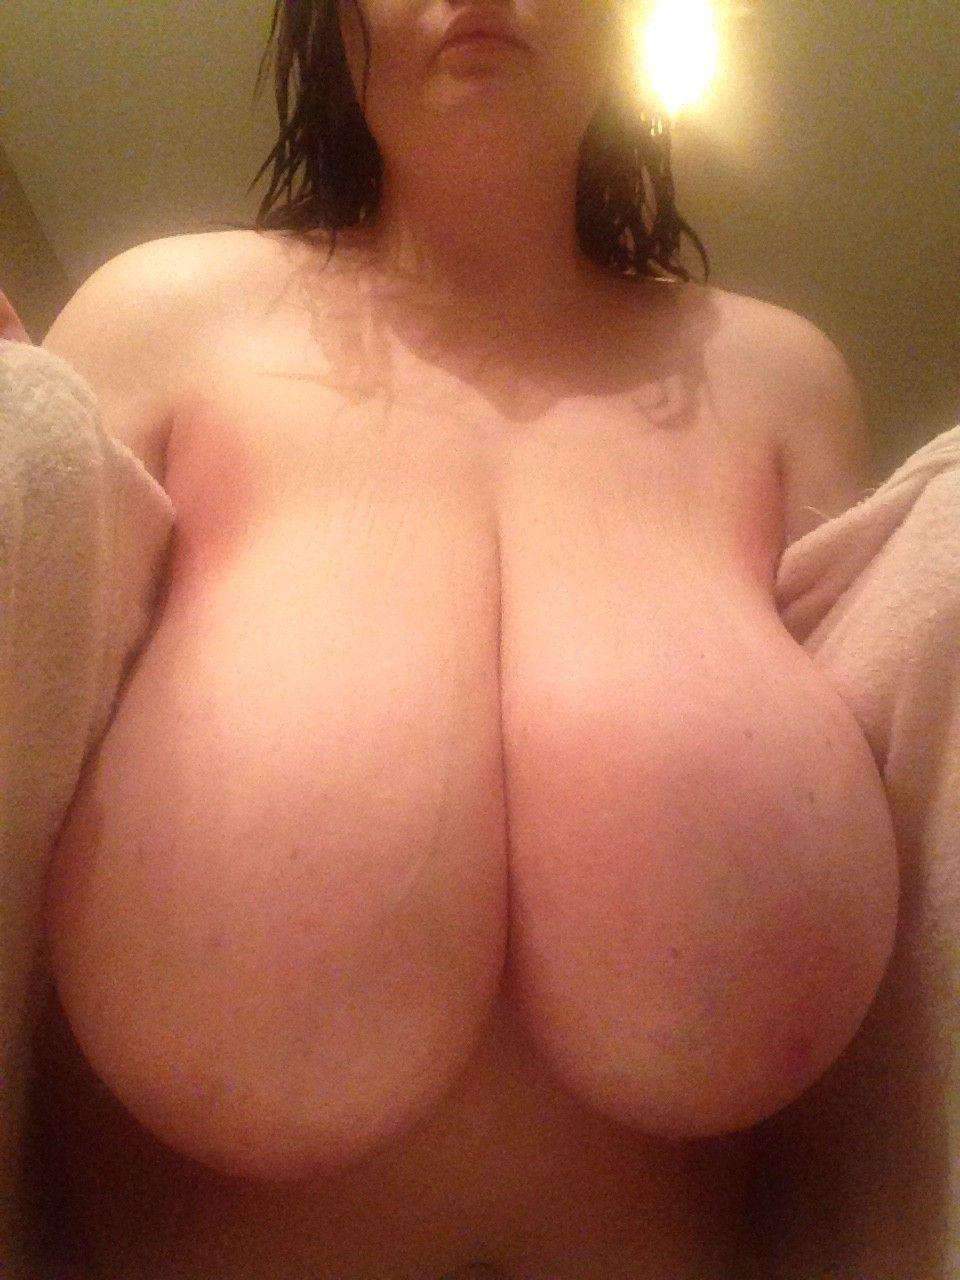 美巨乳ロケット乳超乳女子写真